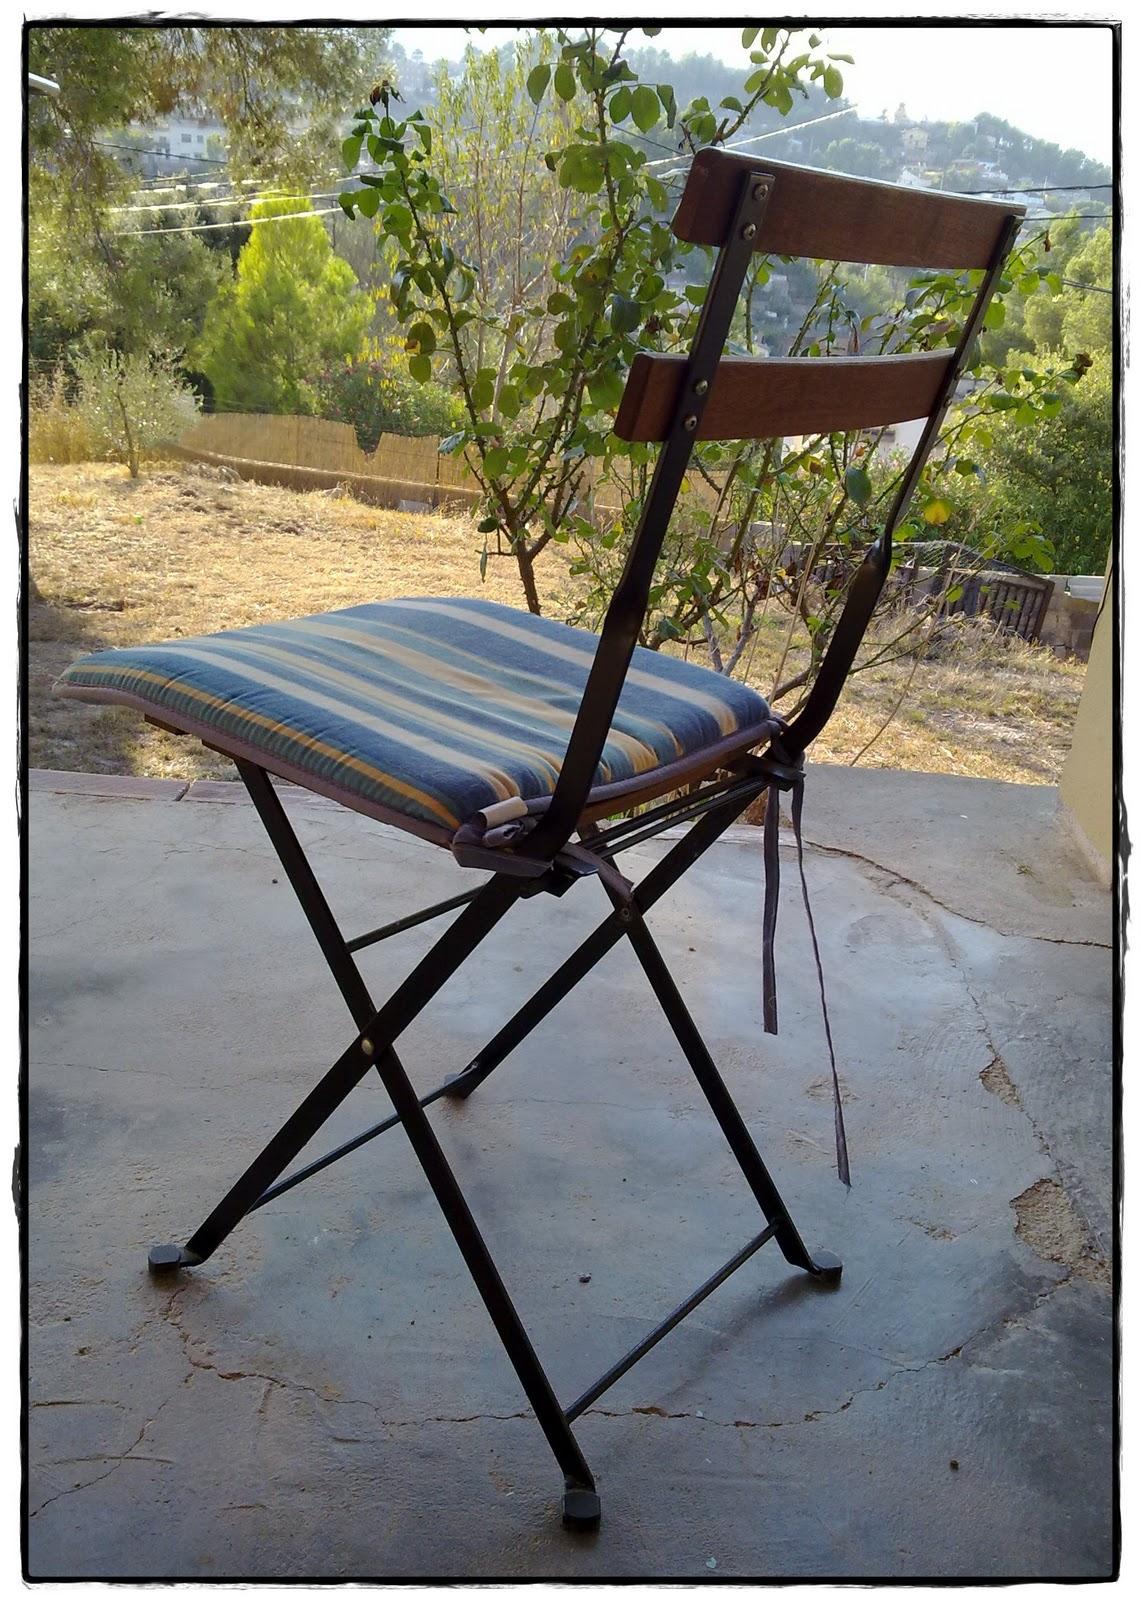 Kan chispis la silla vac a - La silla vacia ...